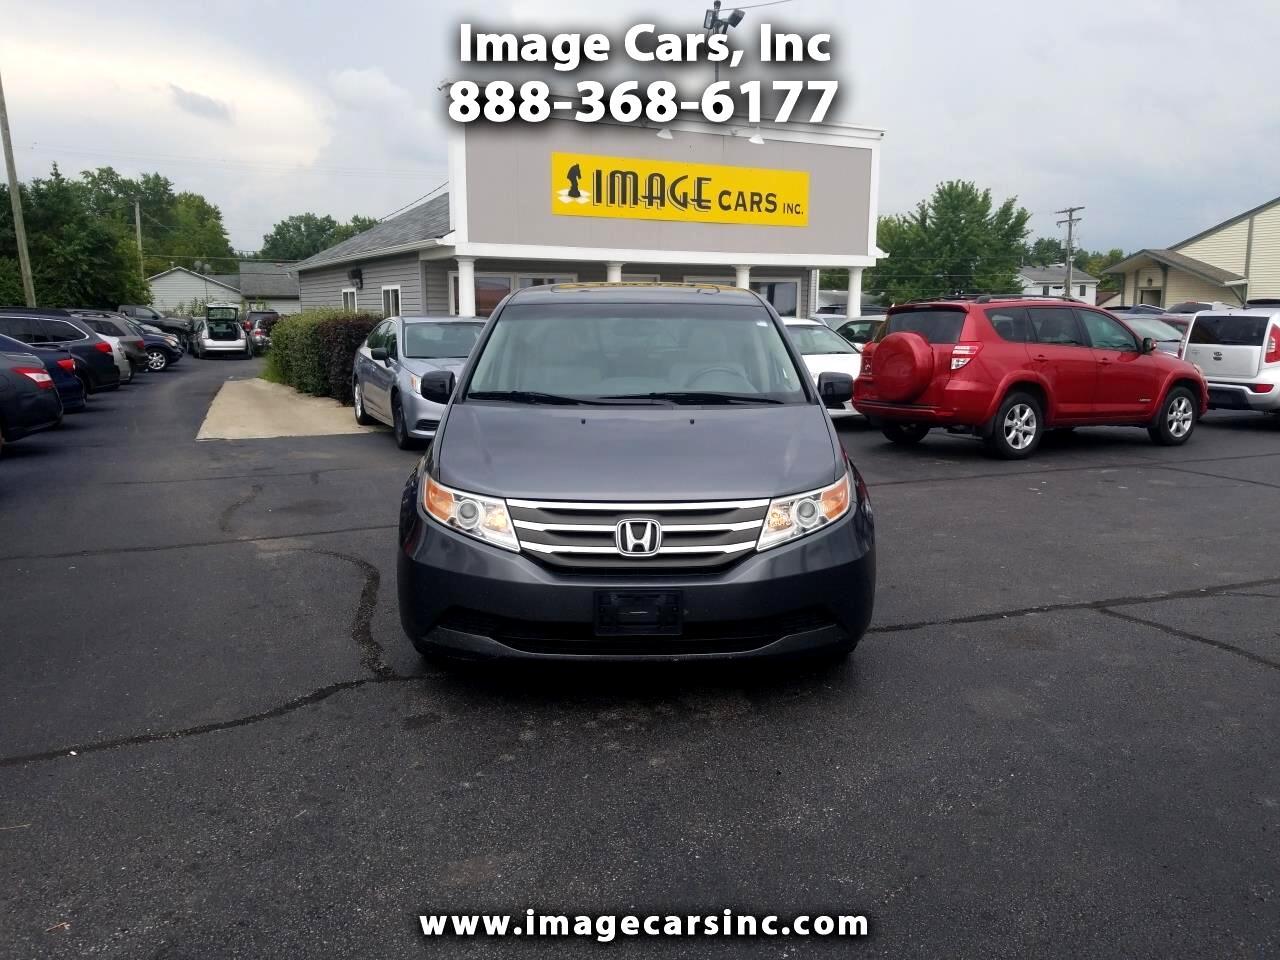 2012 Honda Odyssey EX w/ Leather and Nav System